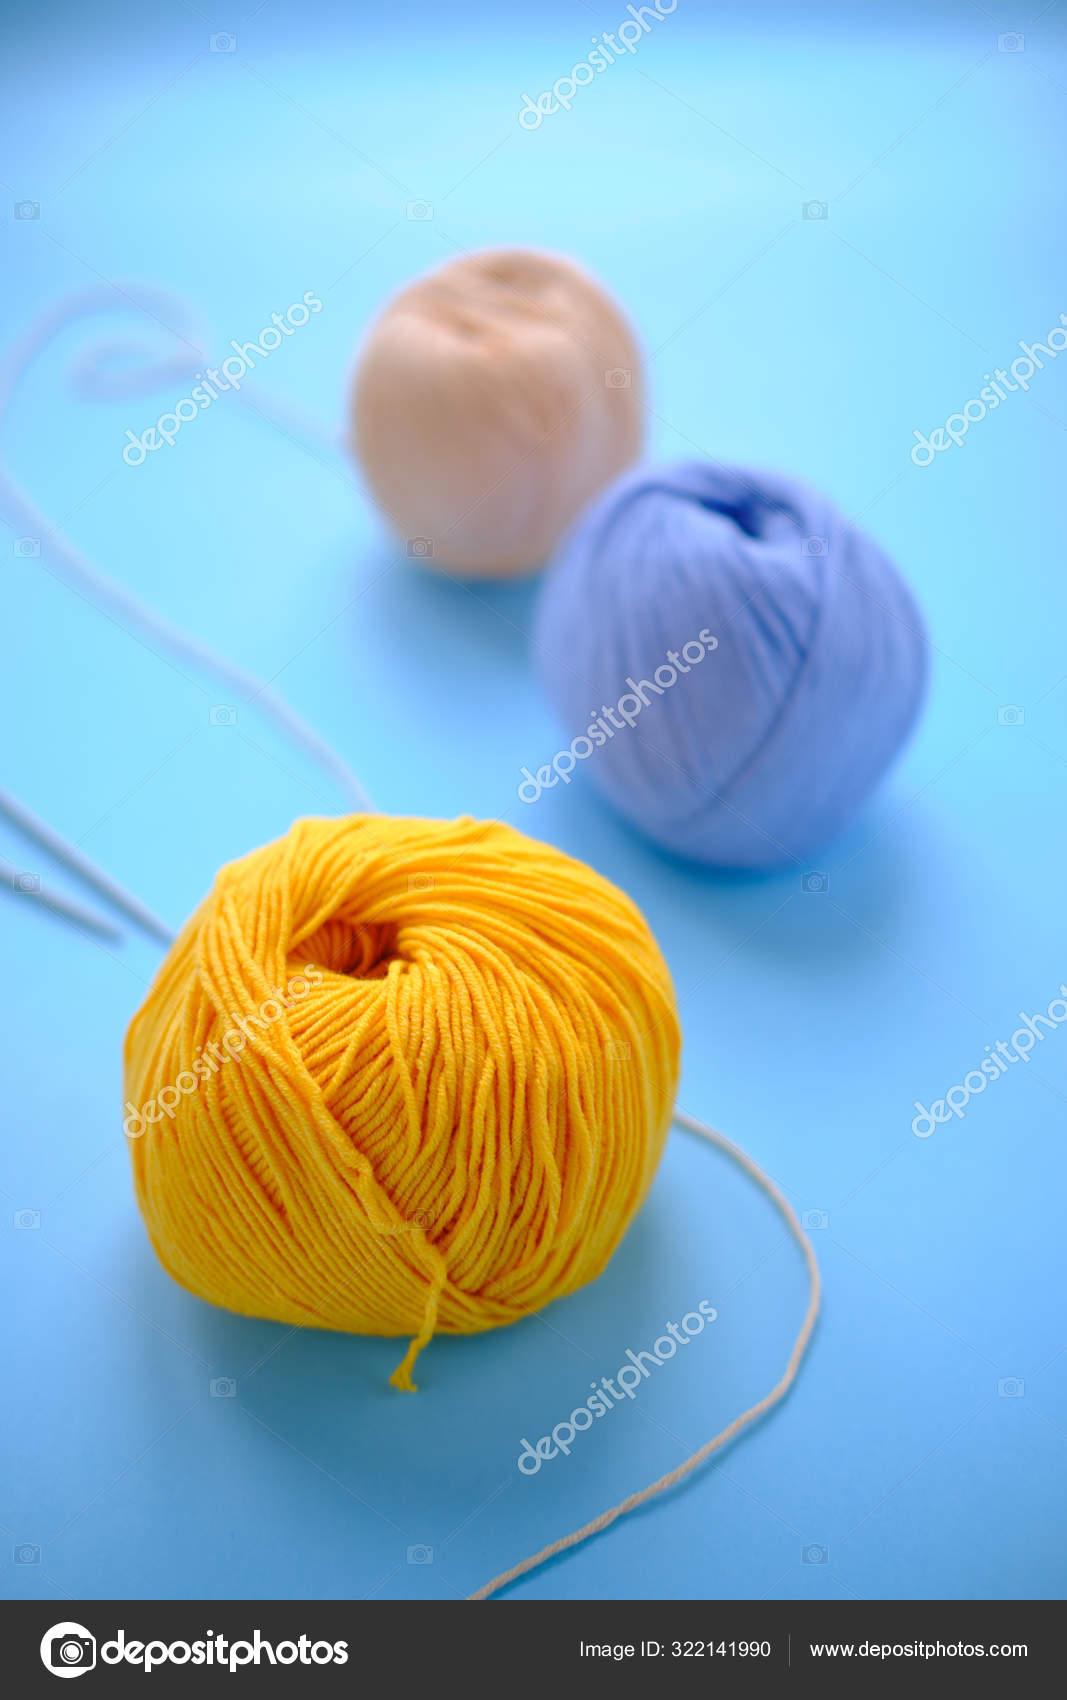 How to change yarn color in amigurumi   Crochet tutorial   lilleliis   1700x1067